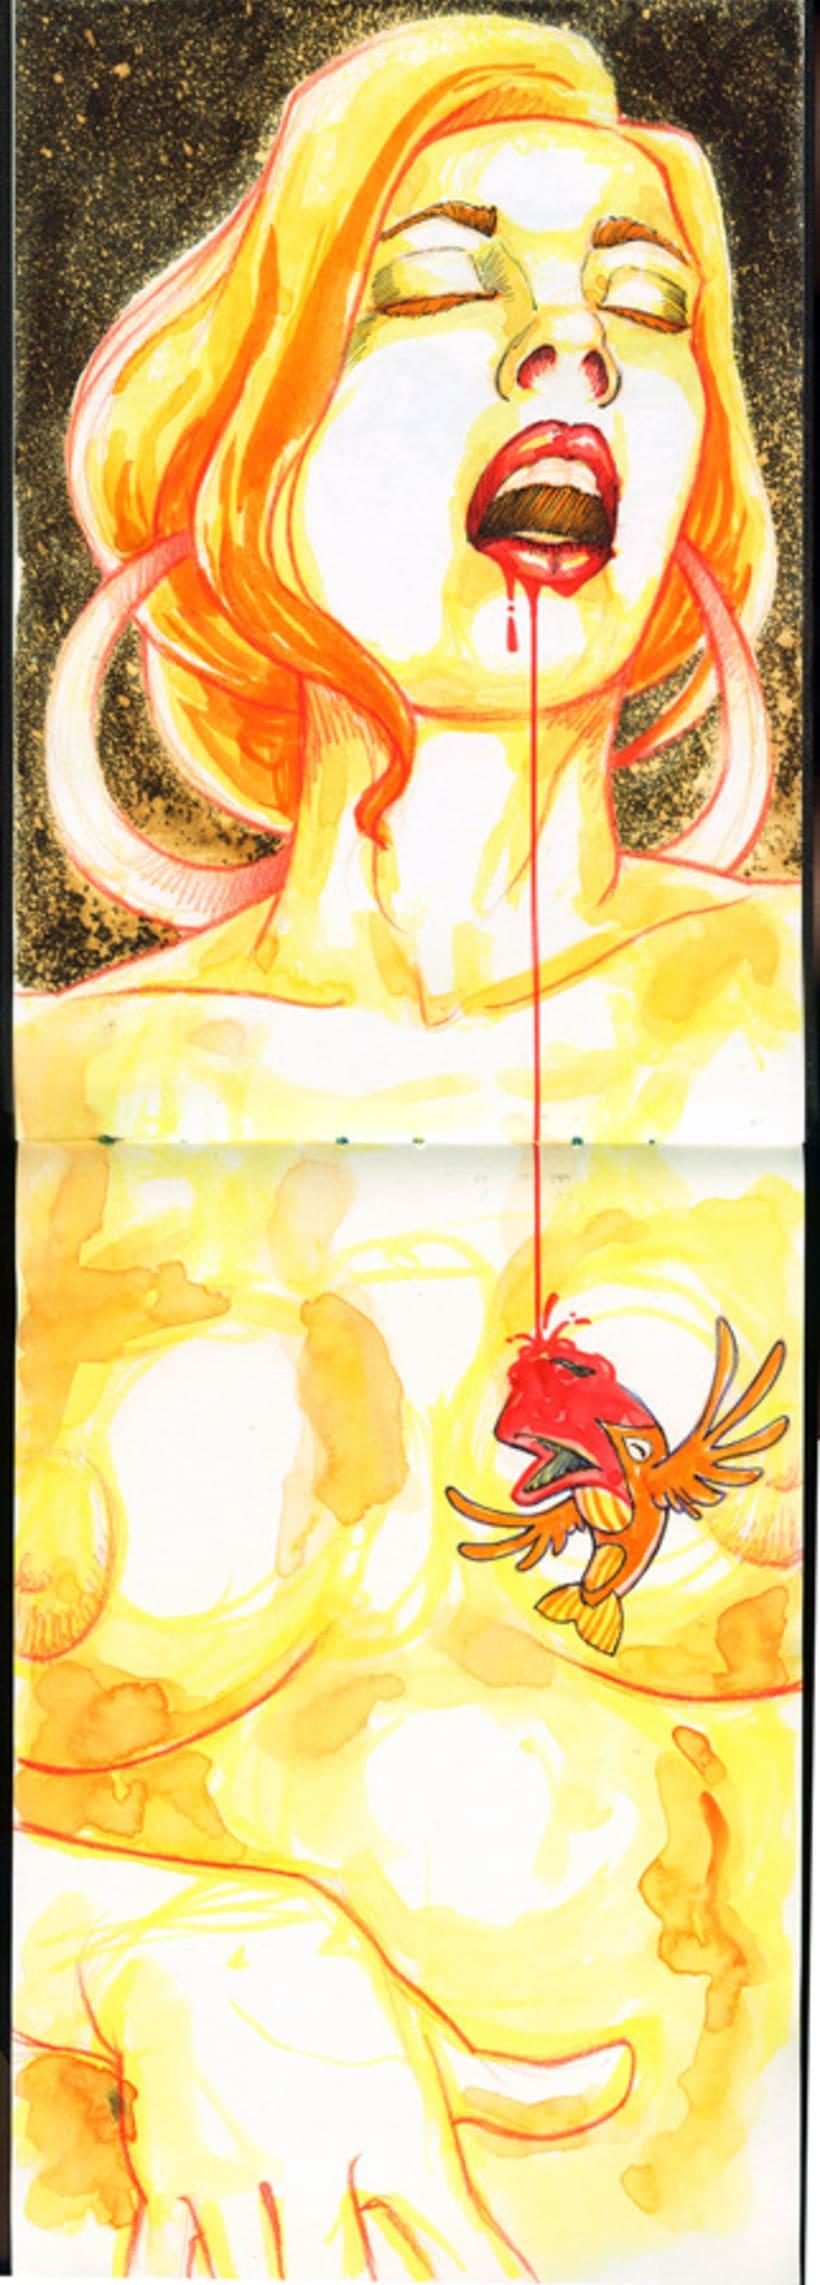 En tránsito (burning) 1